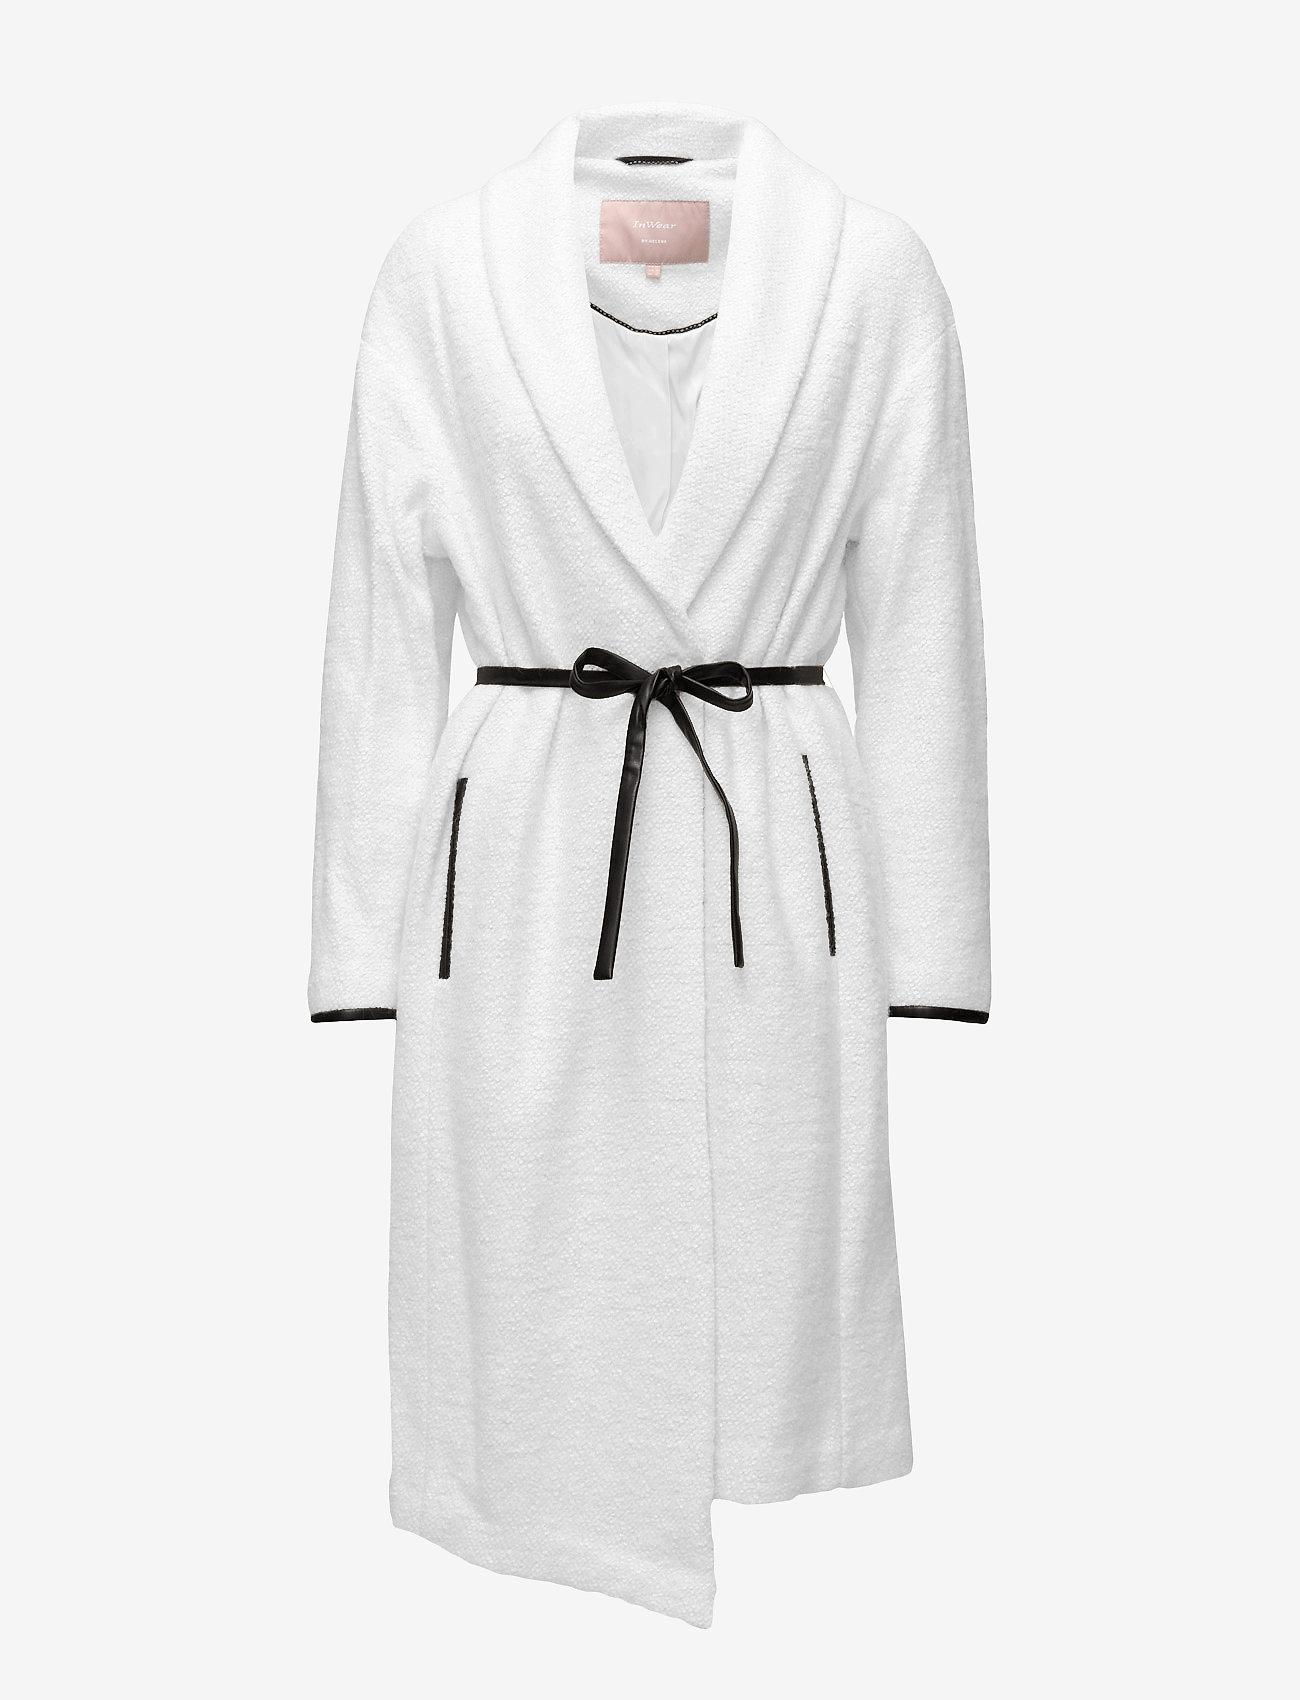 Lea Coat Ow (White Smoke) (600 kr) - InWear uEIzuJtb